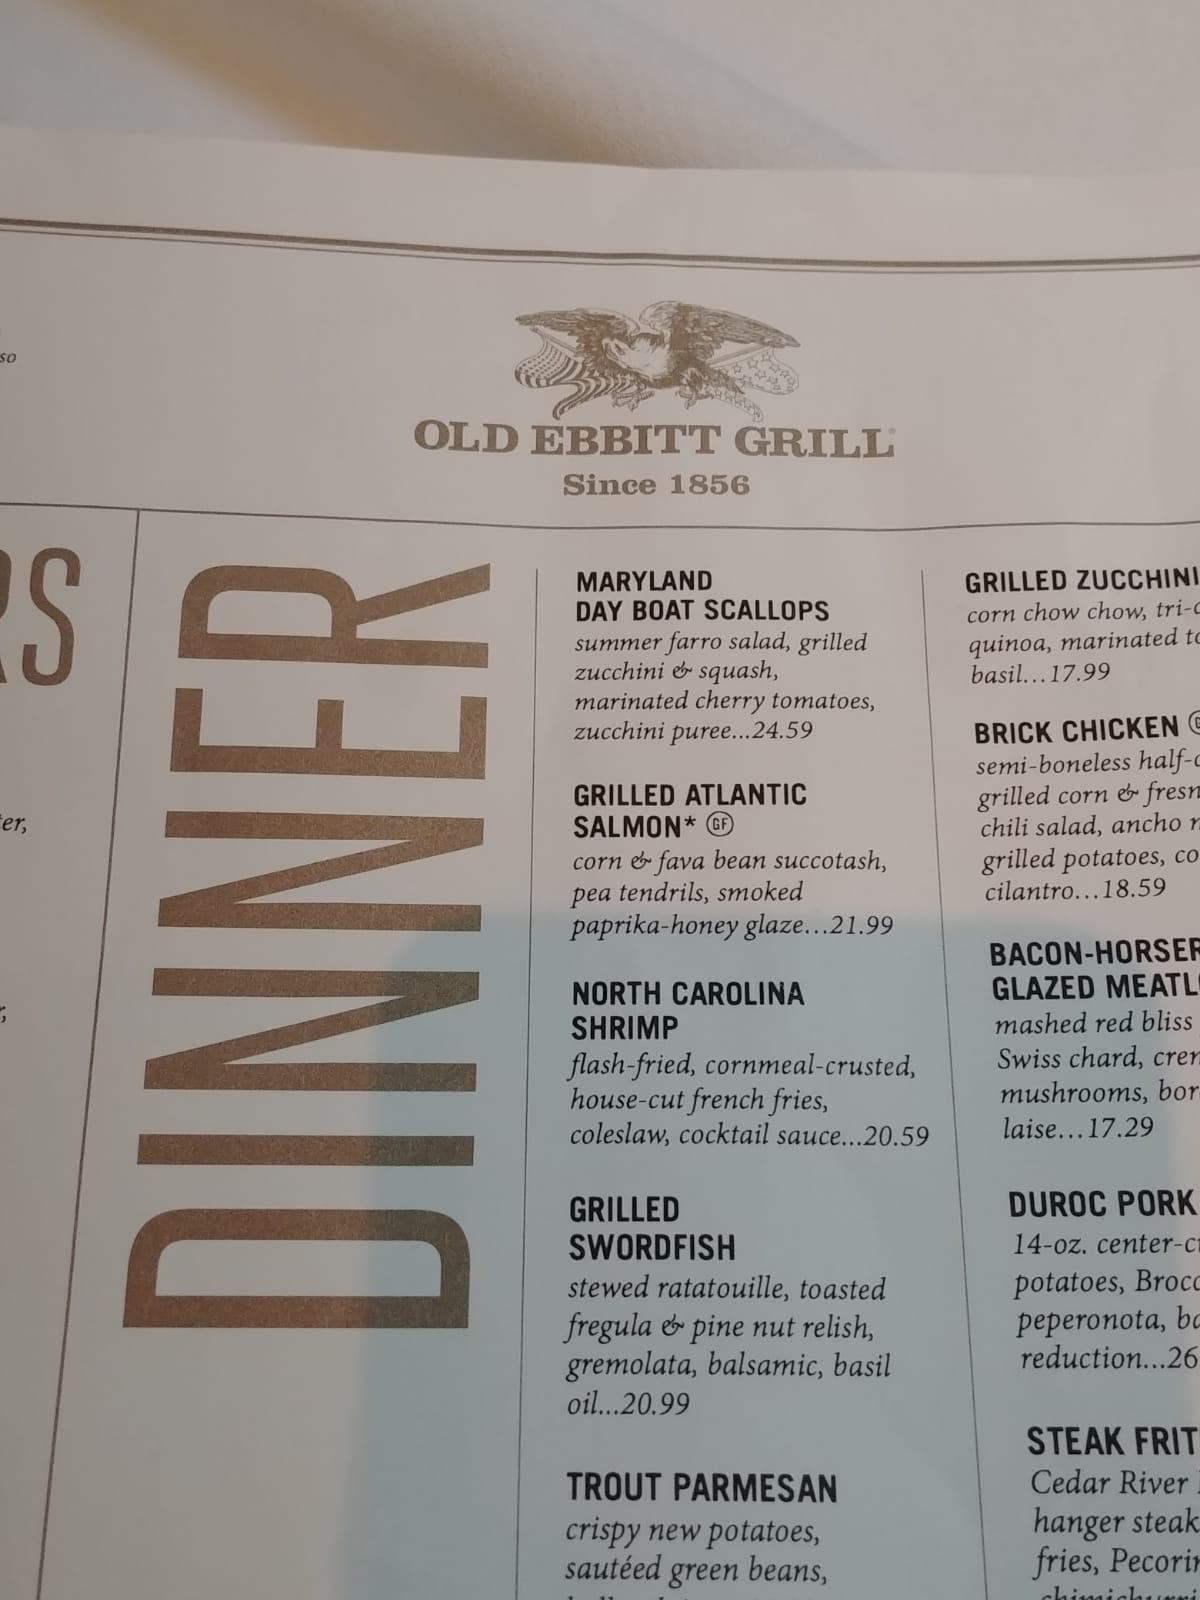 Old Ebbitt Grill America Washington DC Restaurant